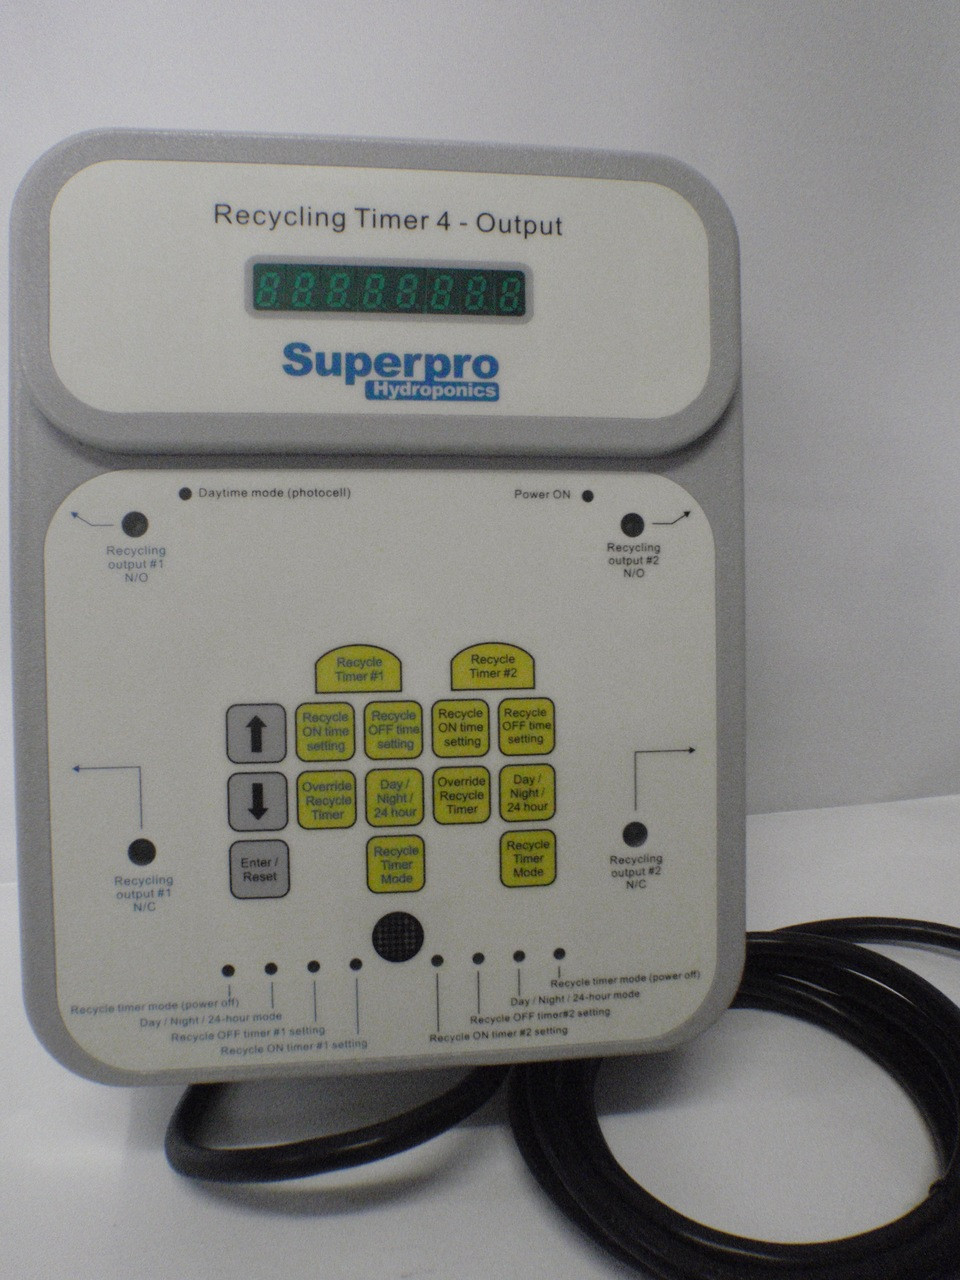 SuperPro MFRT-1 Recycling Timer 4 outlet